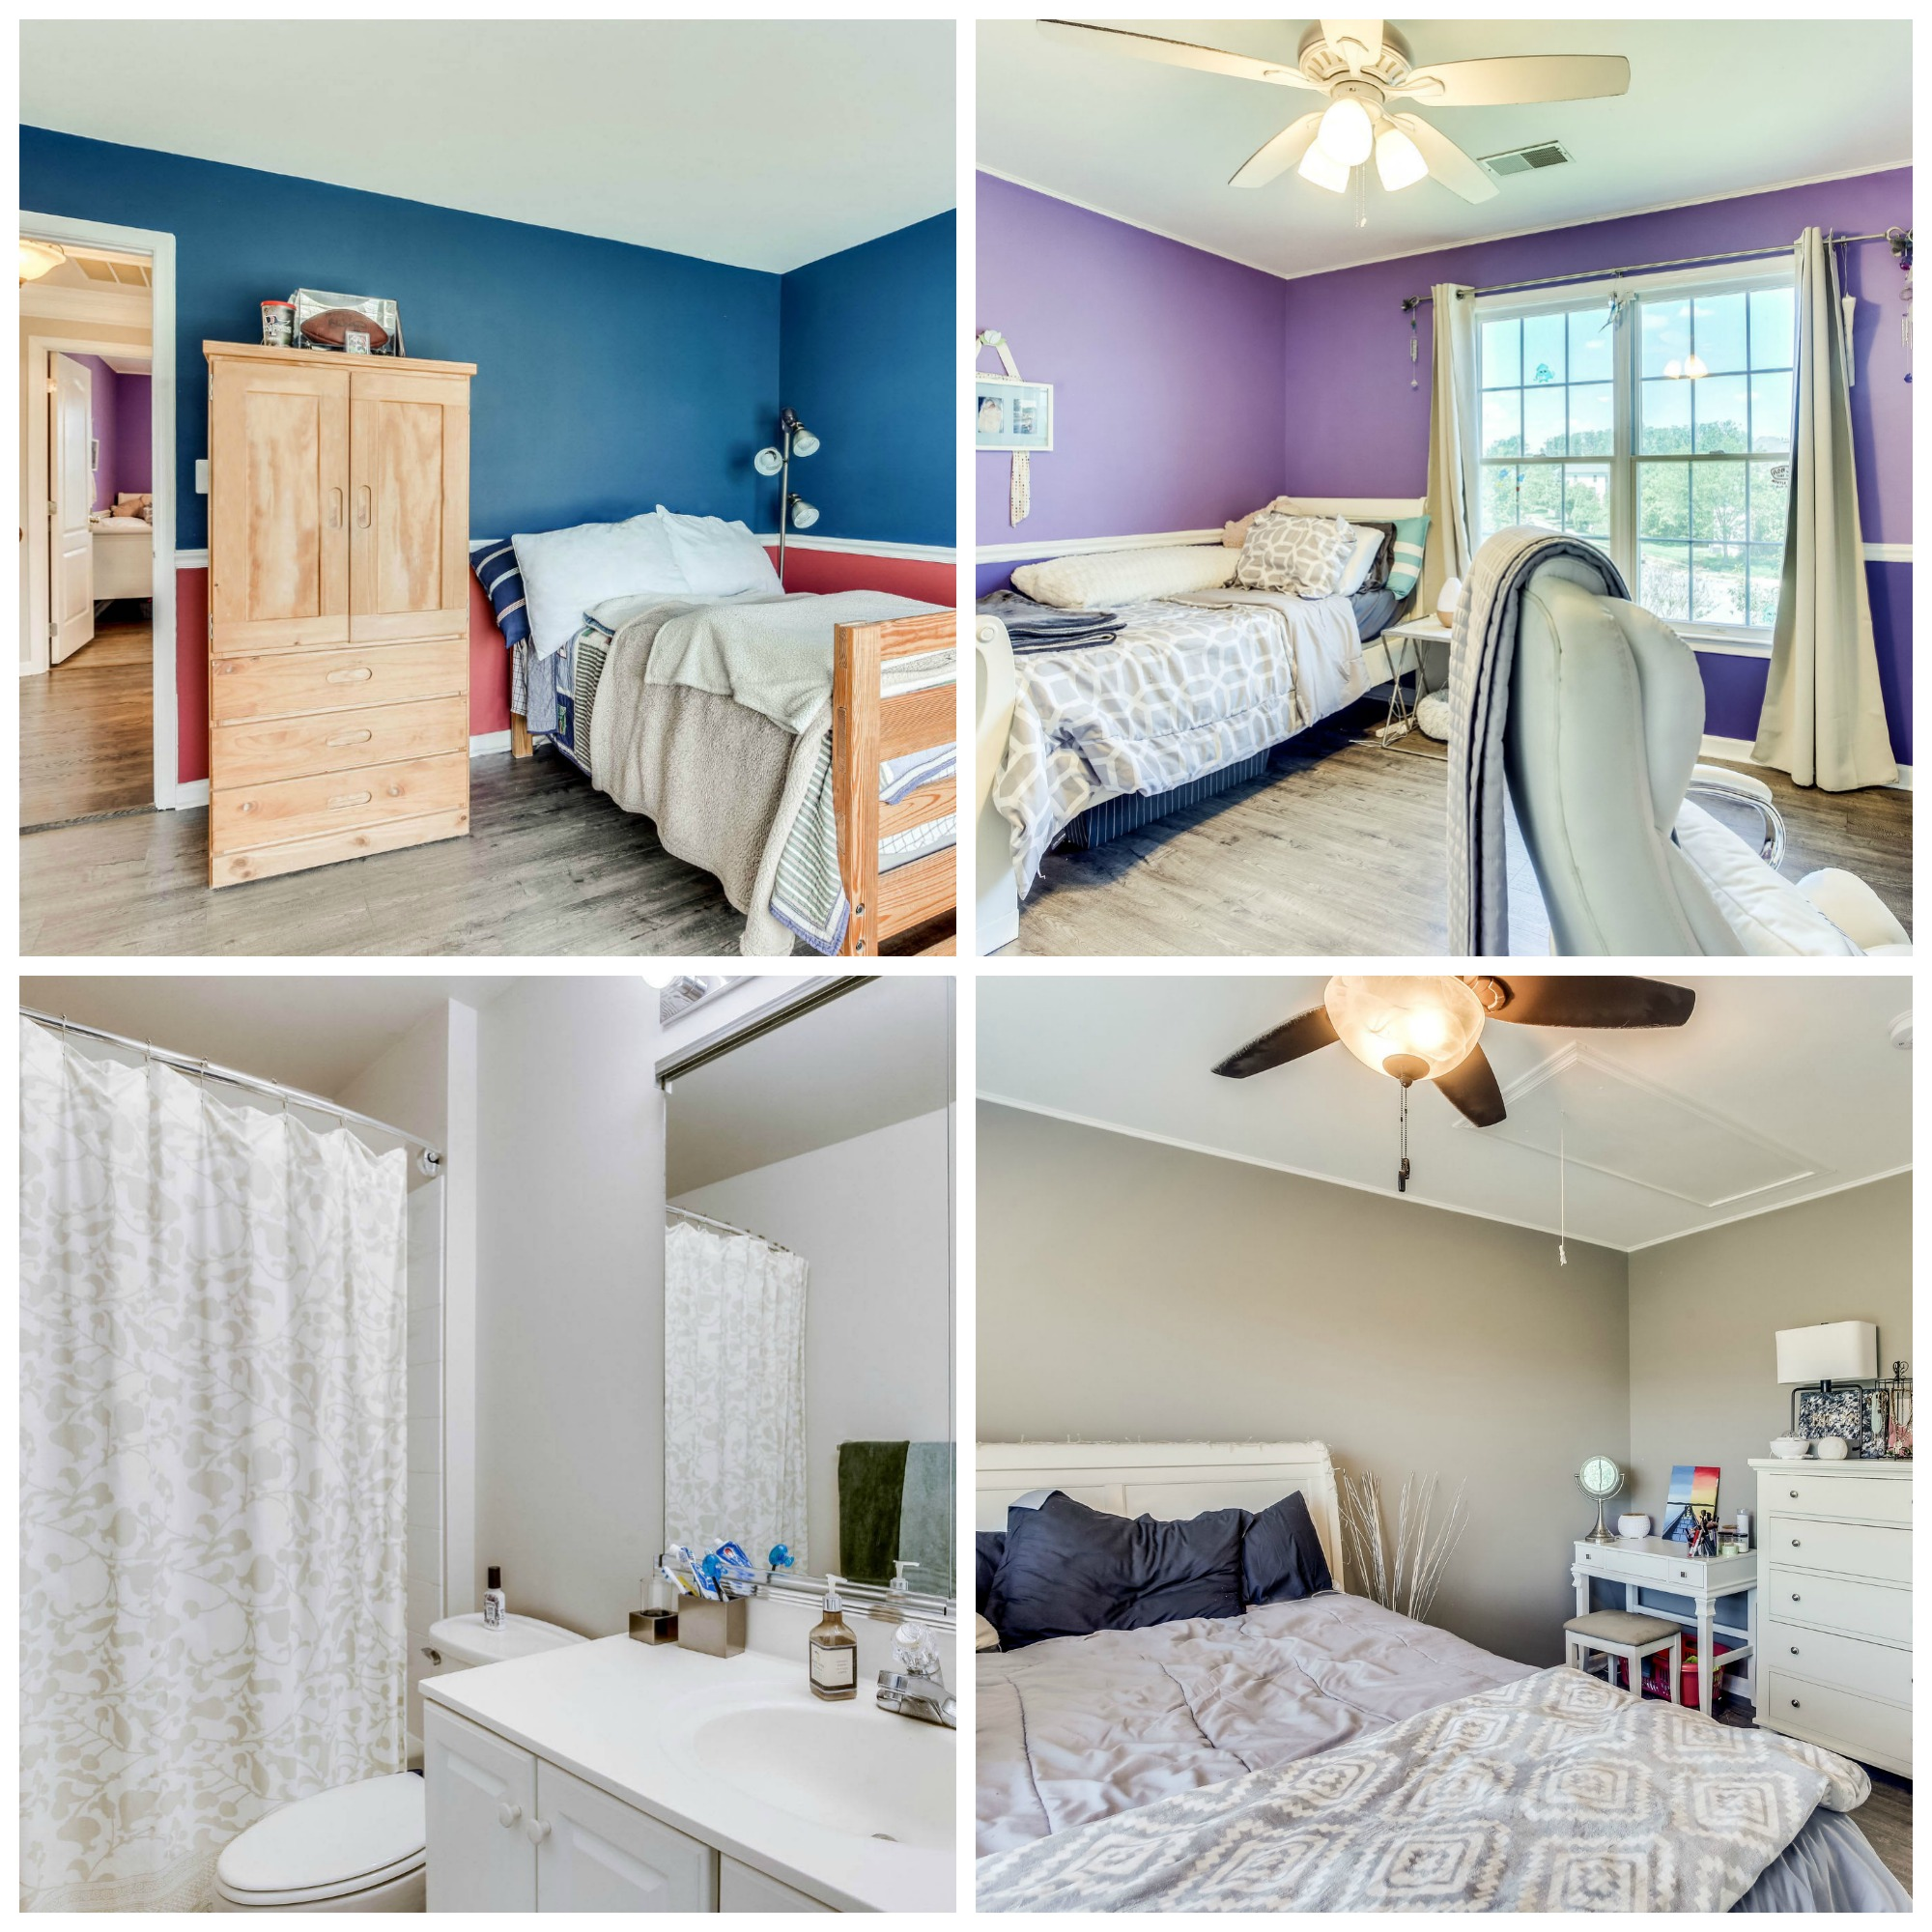 22766 Oatlands Grove Pl, Ashburn- Additional Bedrooms and Bathroom